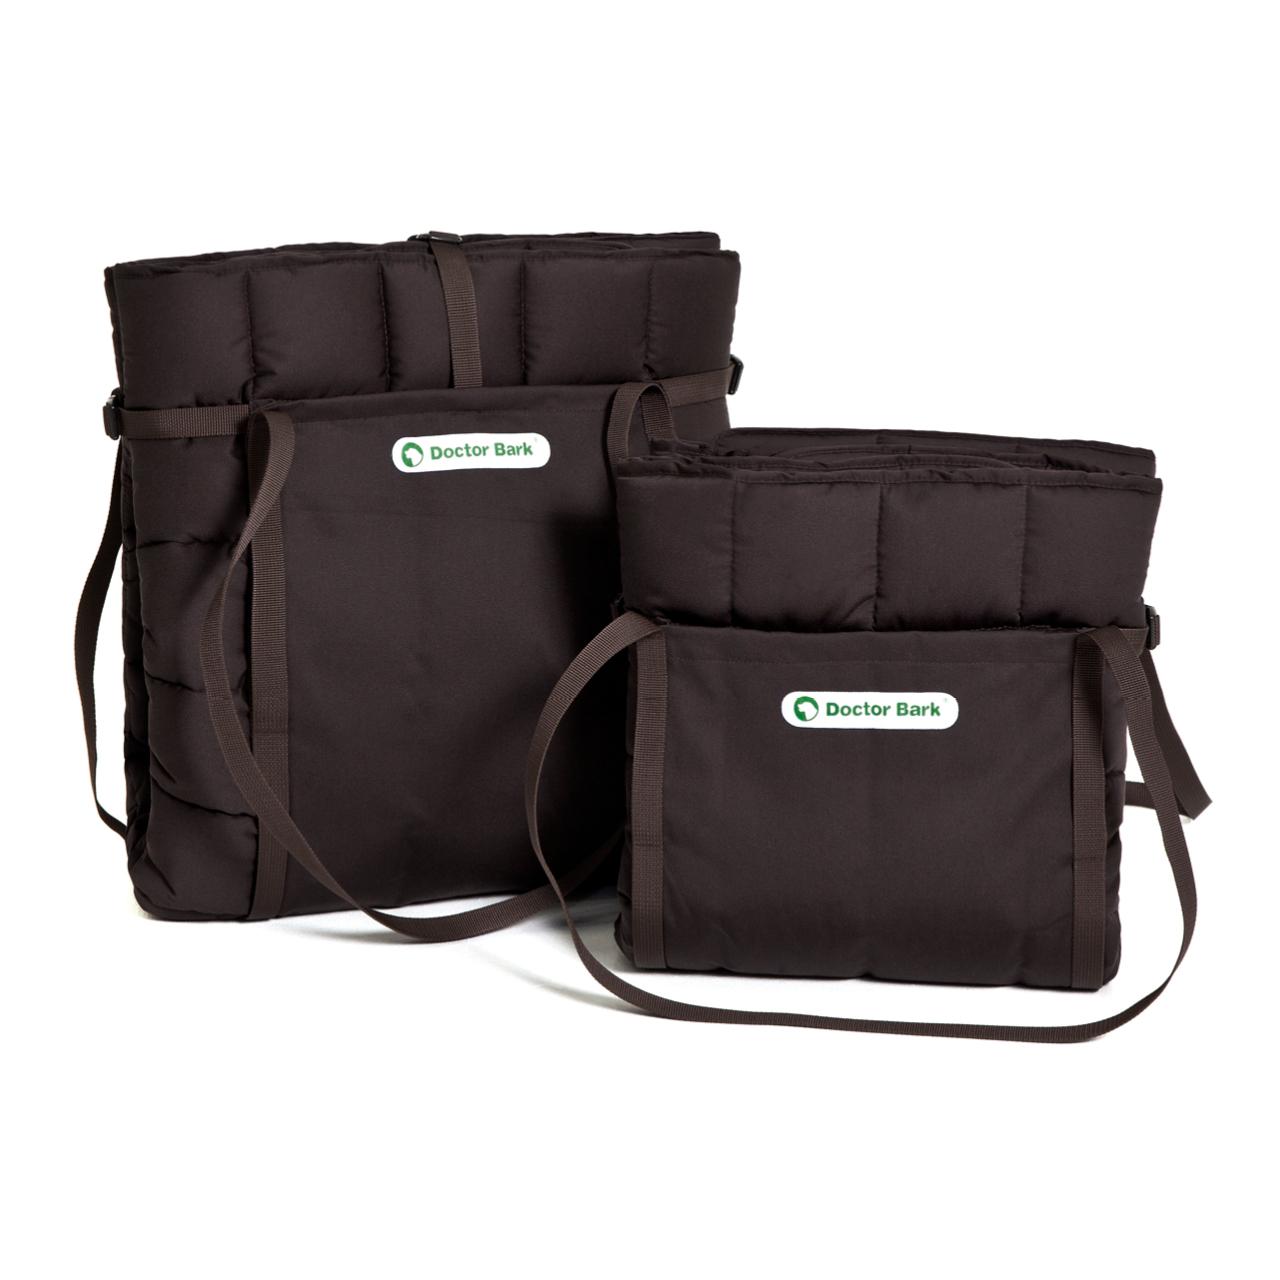 Reisedecke / Travel-Bag braun